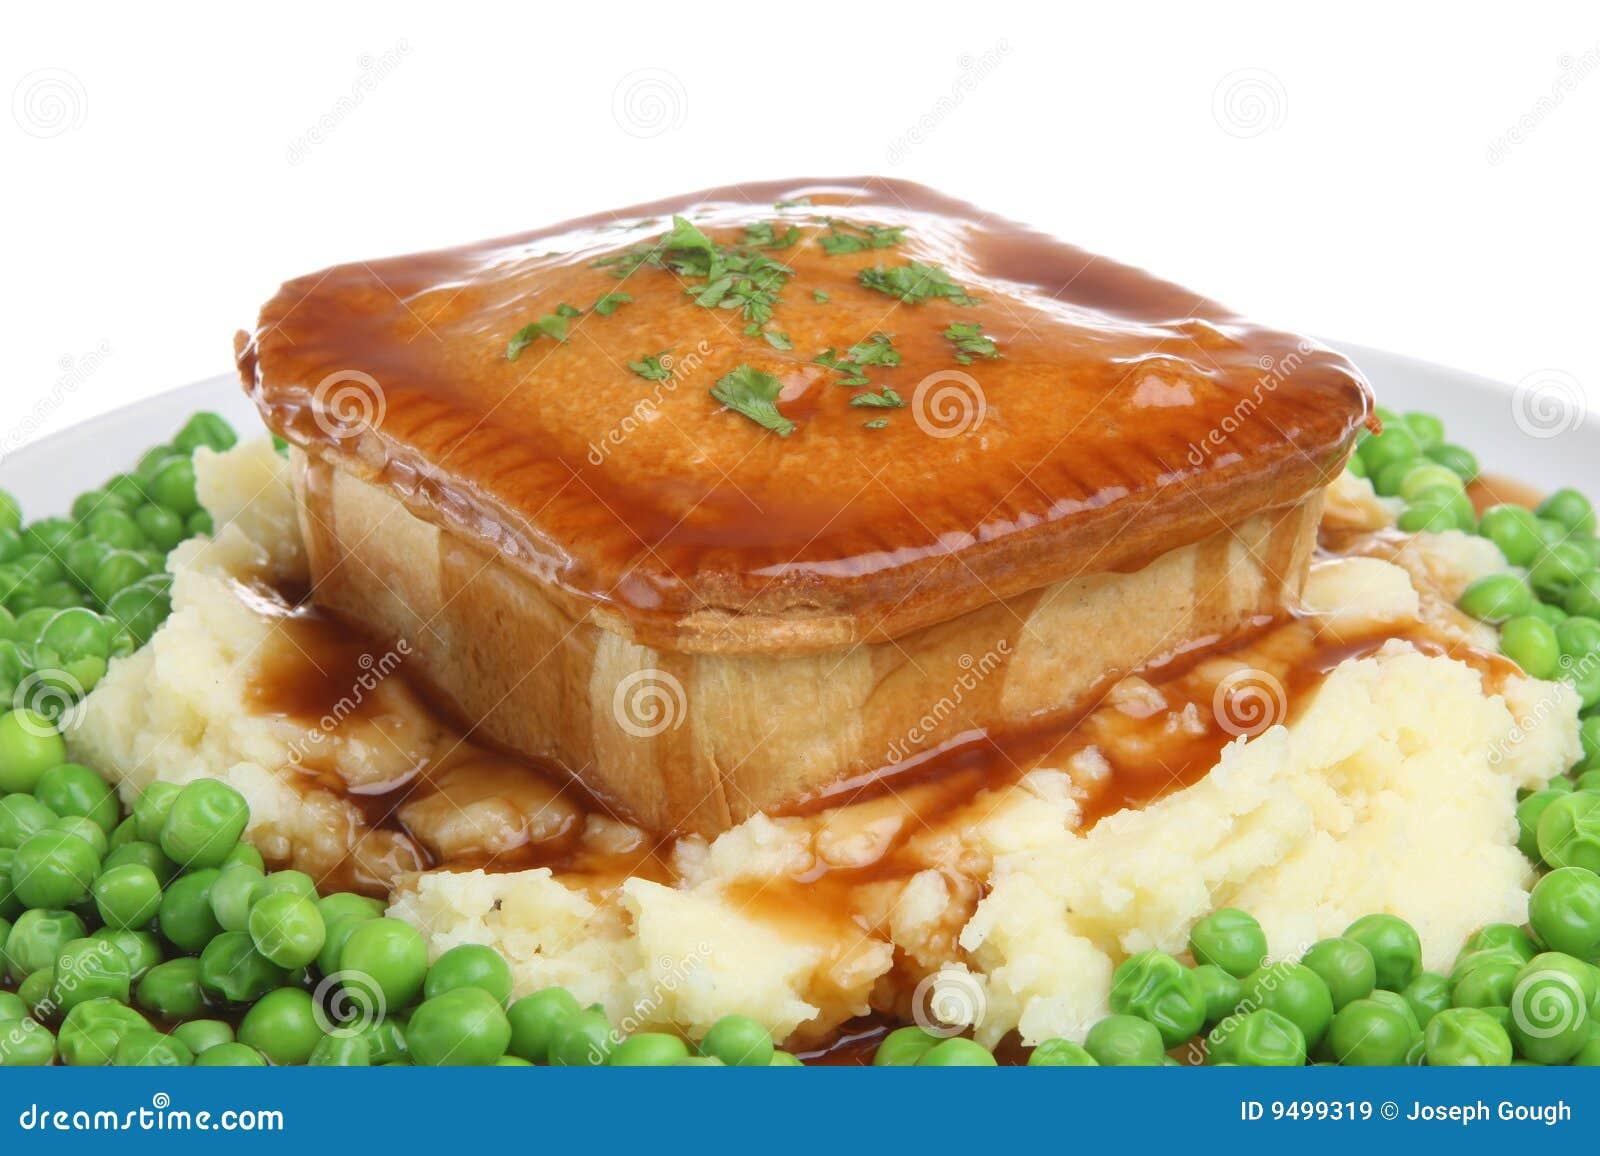 Steak Pie, Mash, Peas And Gravy Stock Image - Image of ...